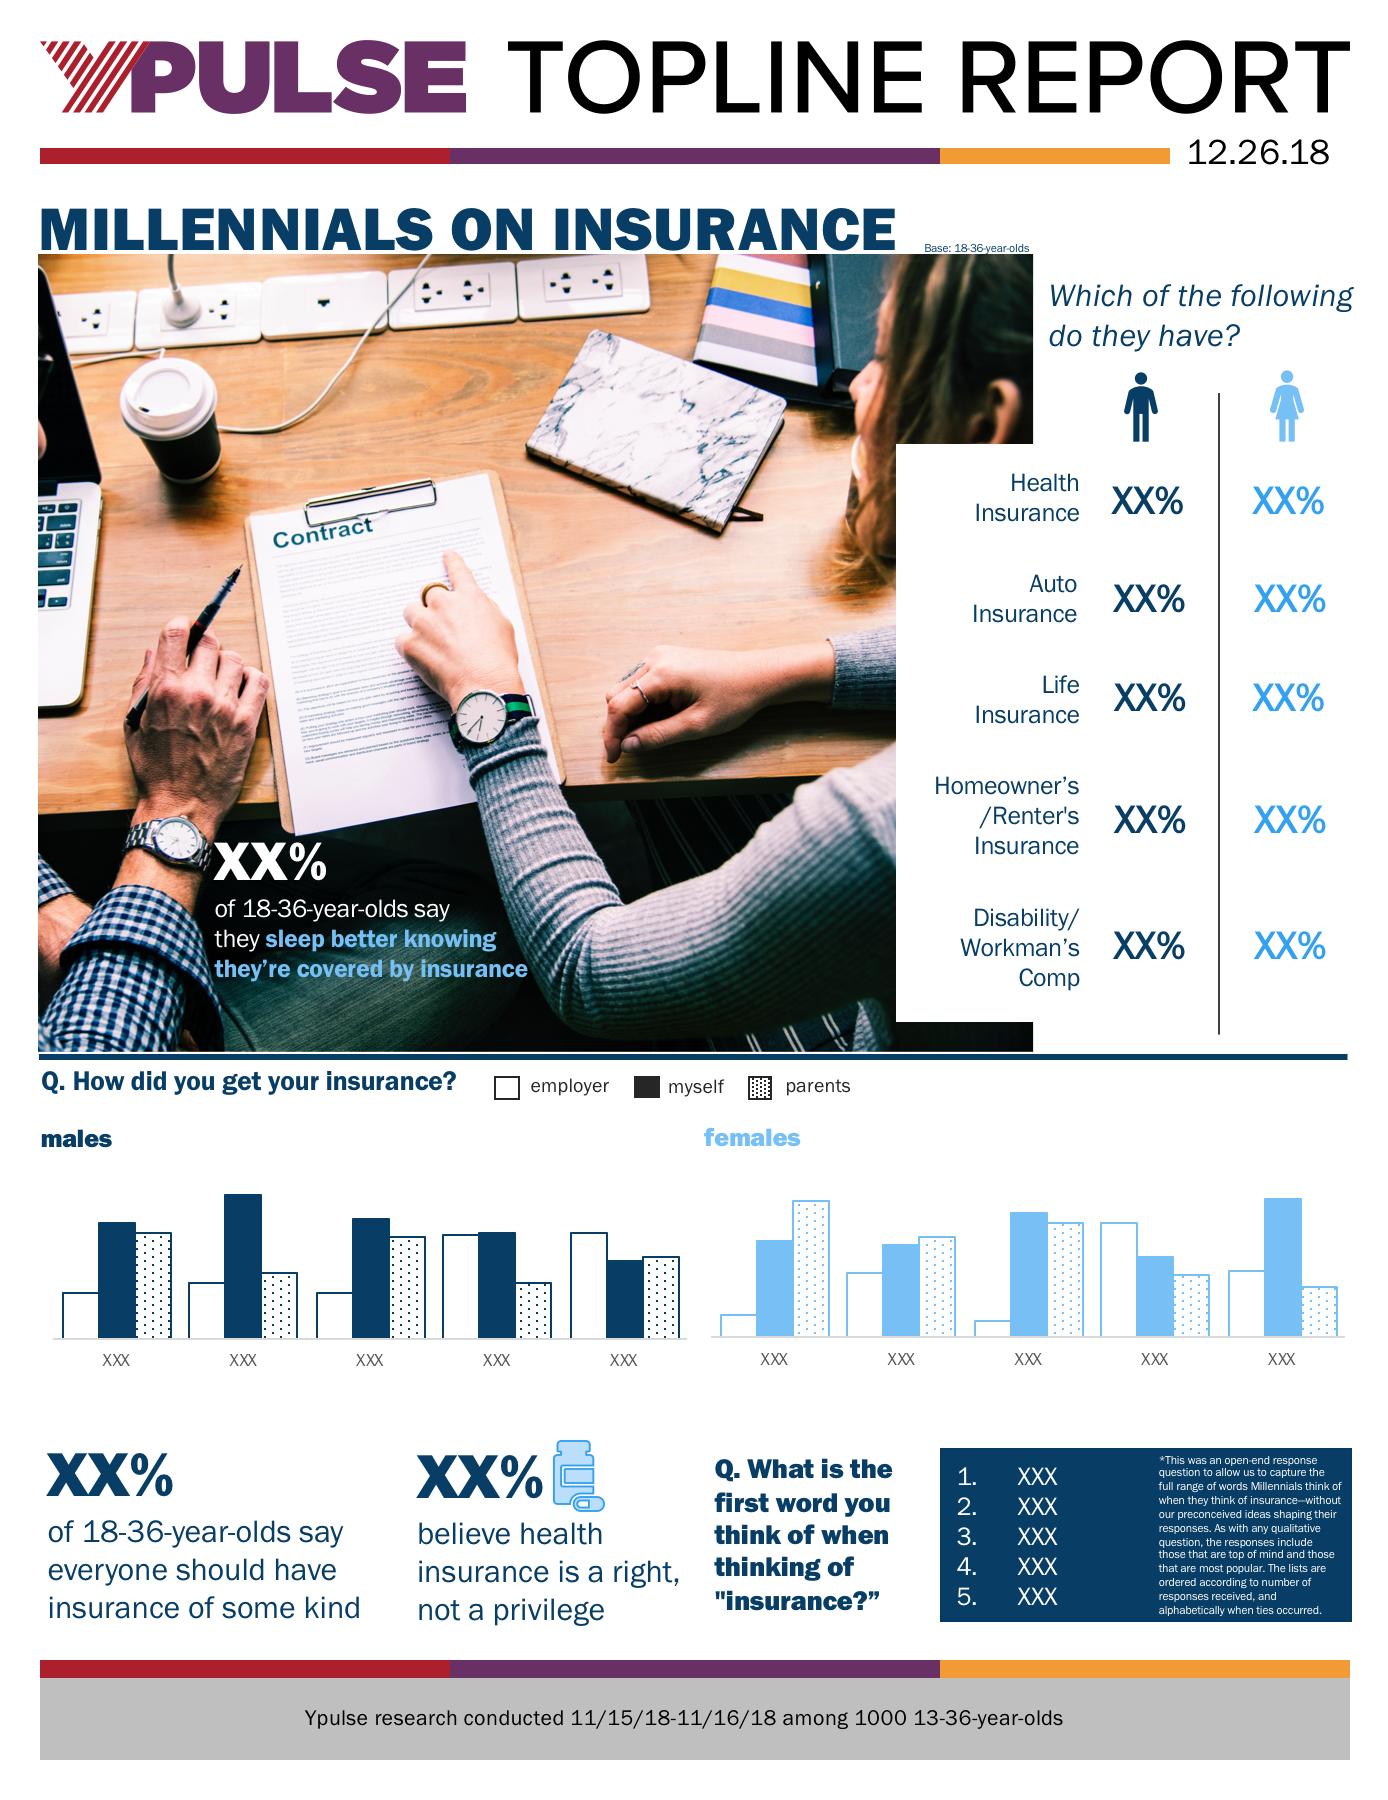 Topline: Insurance